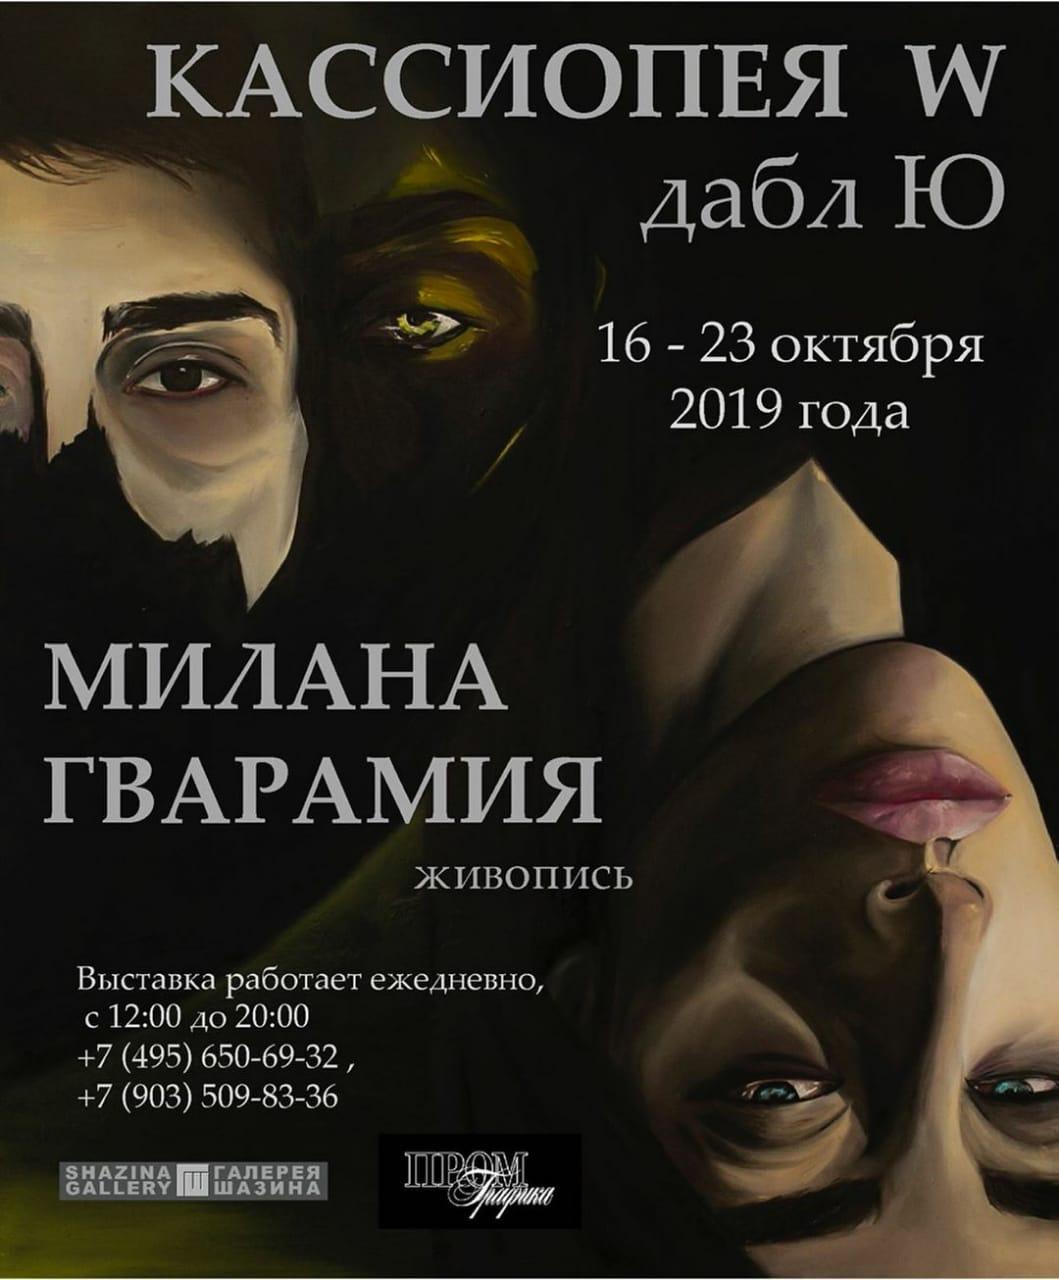 МИЛАНА ГВАРАМИЯ. Видео отчёт с выставки. 1